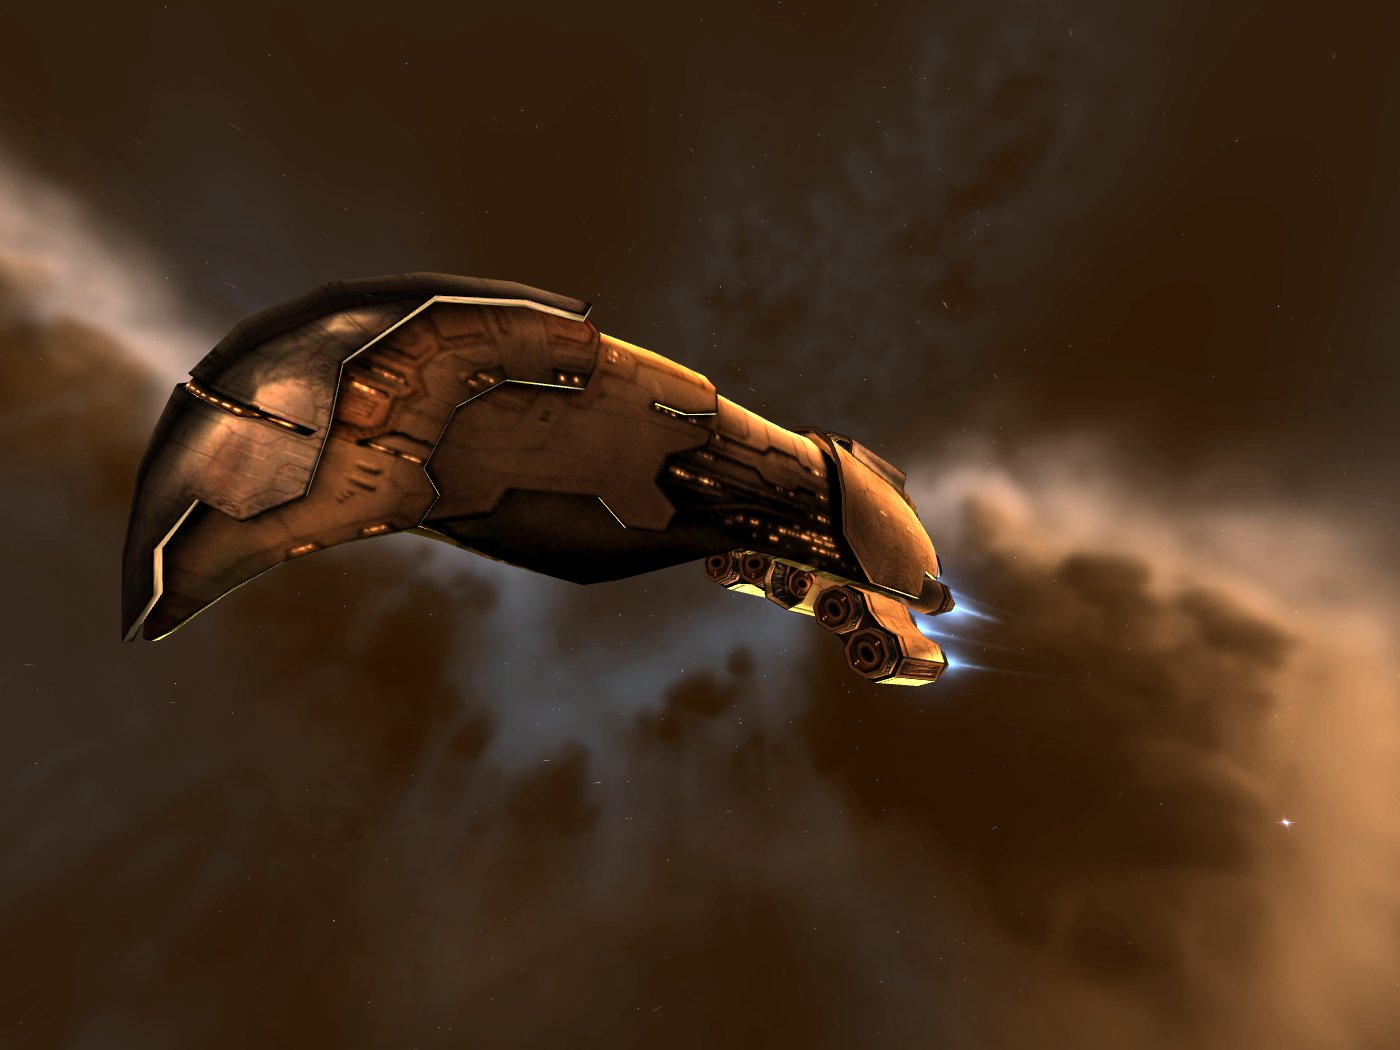 EVE Online (PC) Amarr-heavy-assault-zealot-1